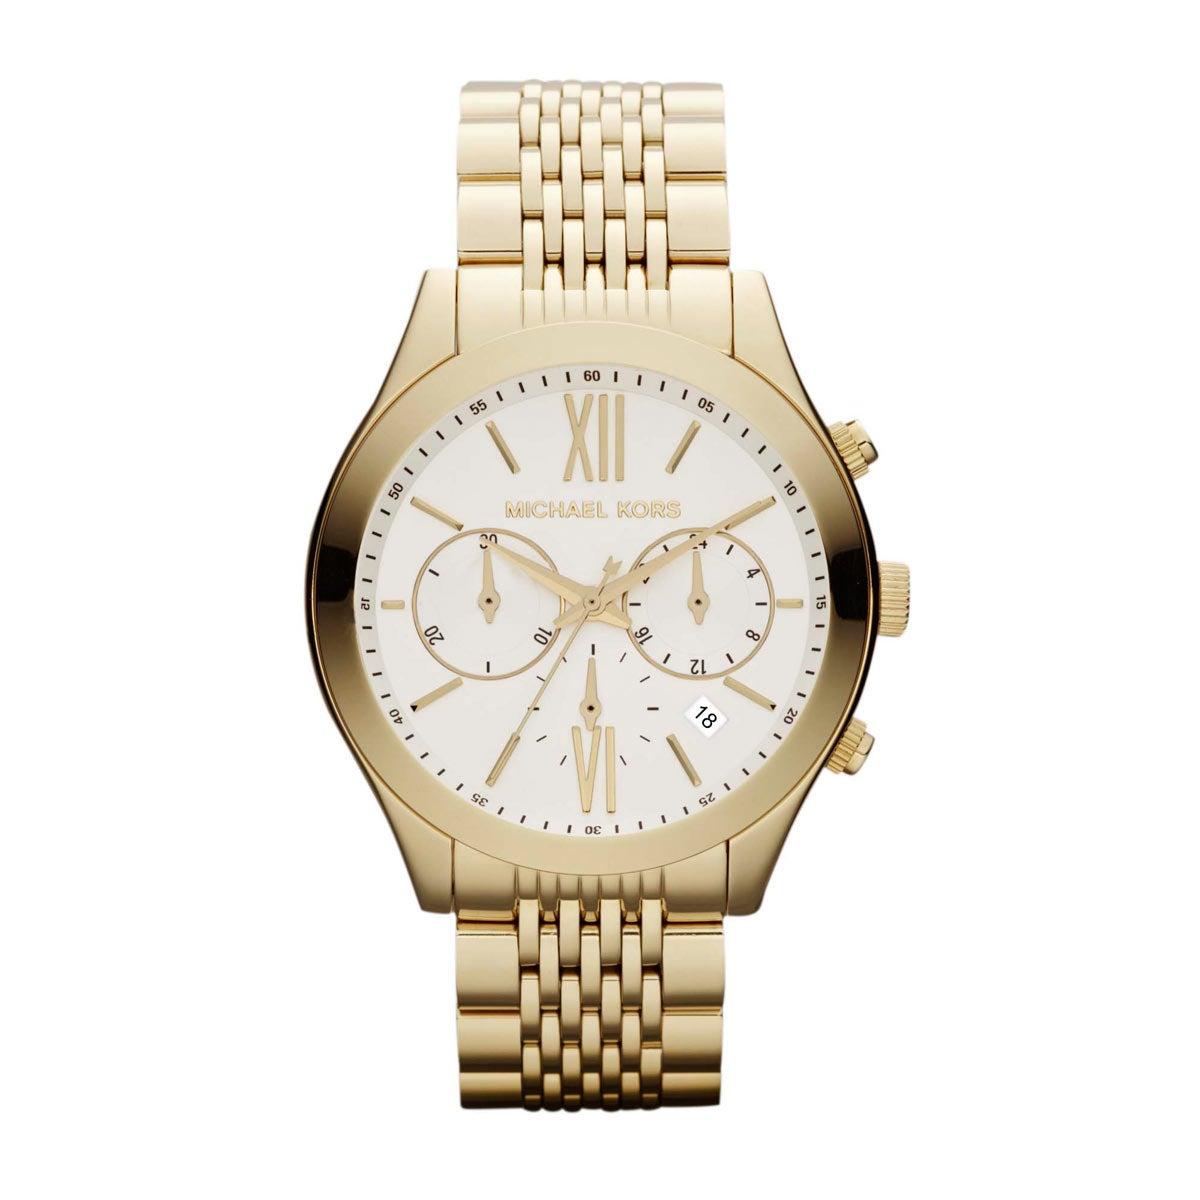 Michael Kors Womens MK5762  Bookton Goldtone Chronograph Watch - Gold/White White